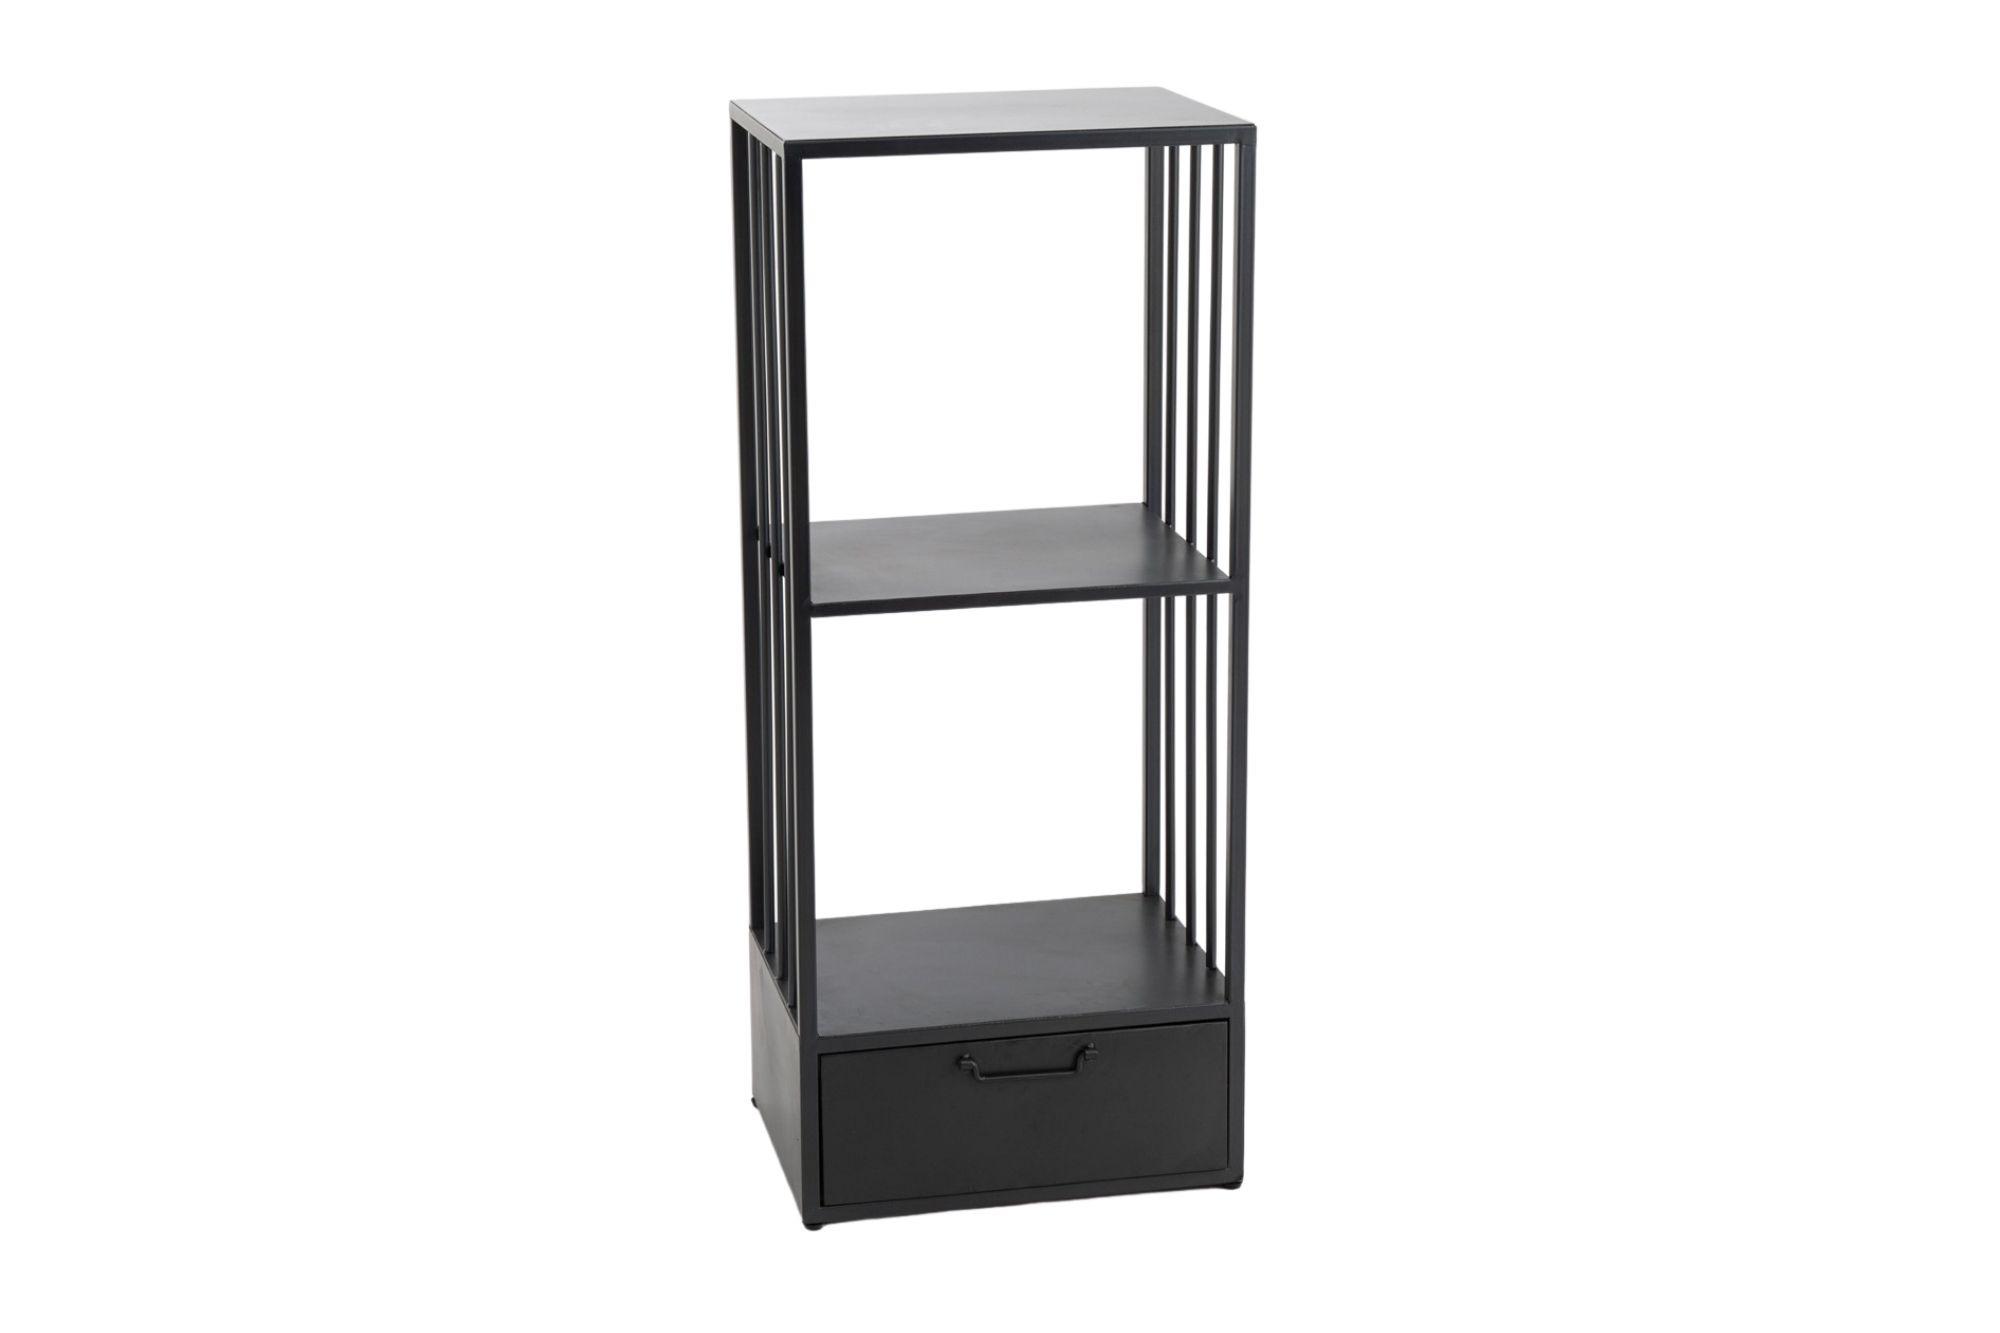 colonne de rangement moderne en metal noir rita hellin